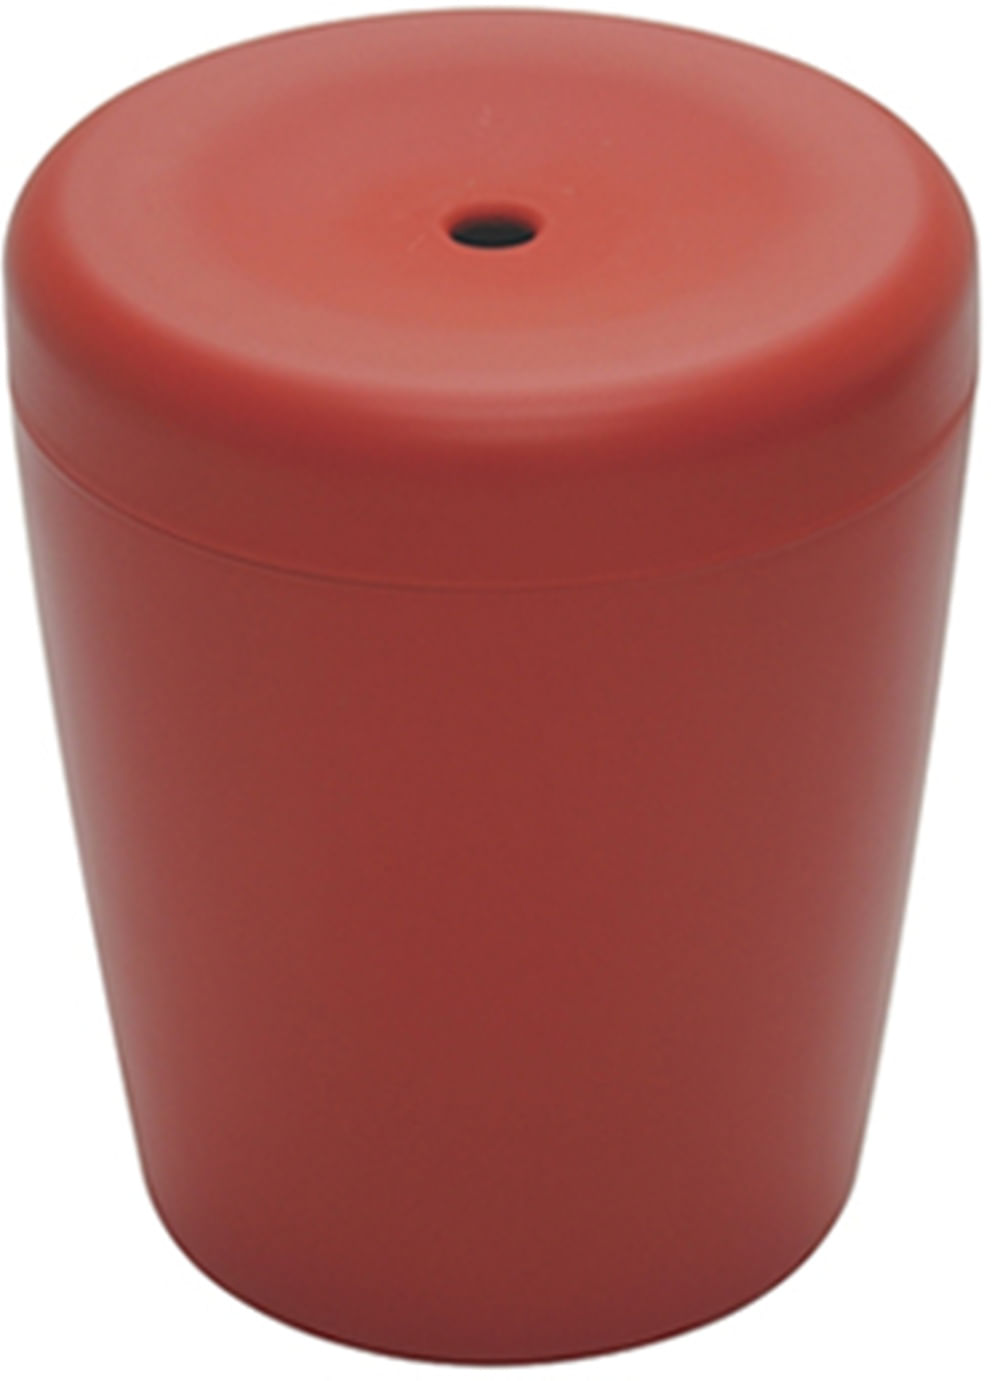 Puff Multiuso Polipropileno Vermelho - 19542